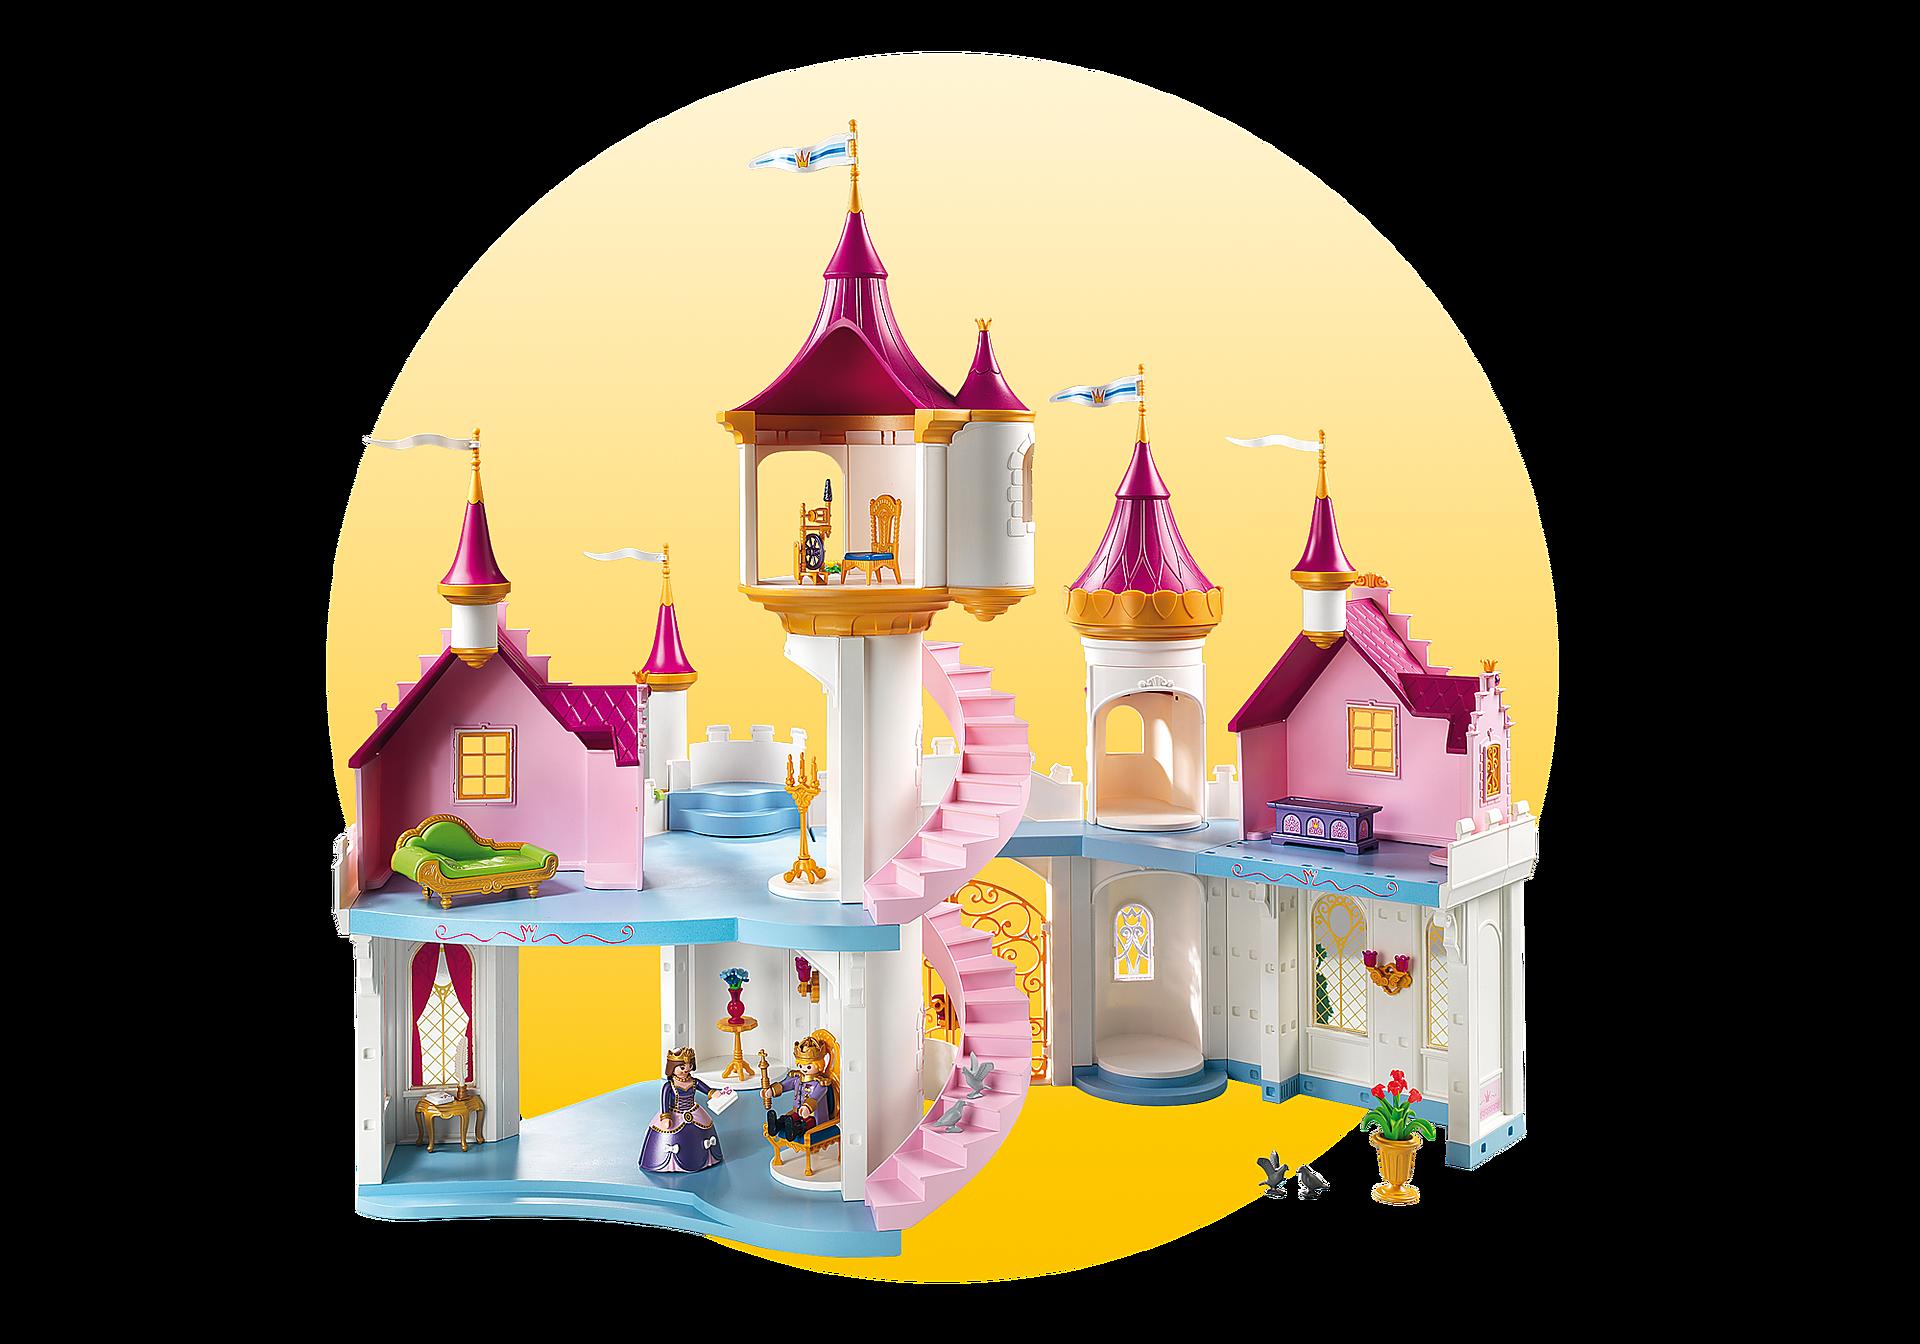 http://media.playmobil.com/i/playmobil/6848_product_extra4/Prinzessinnenschloss